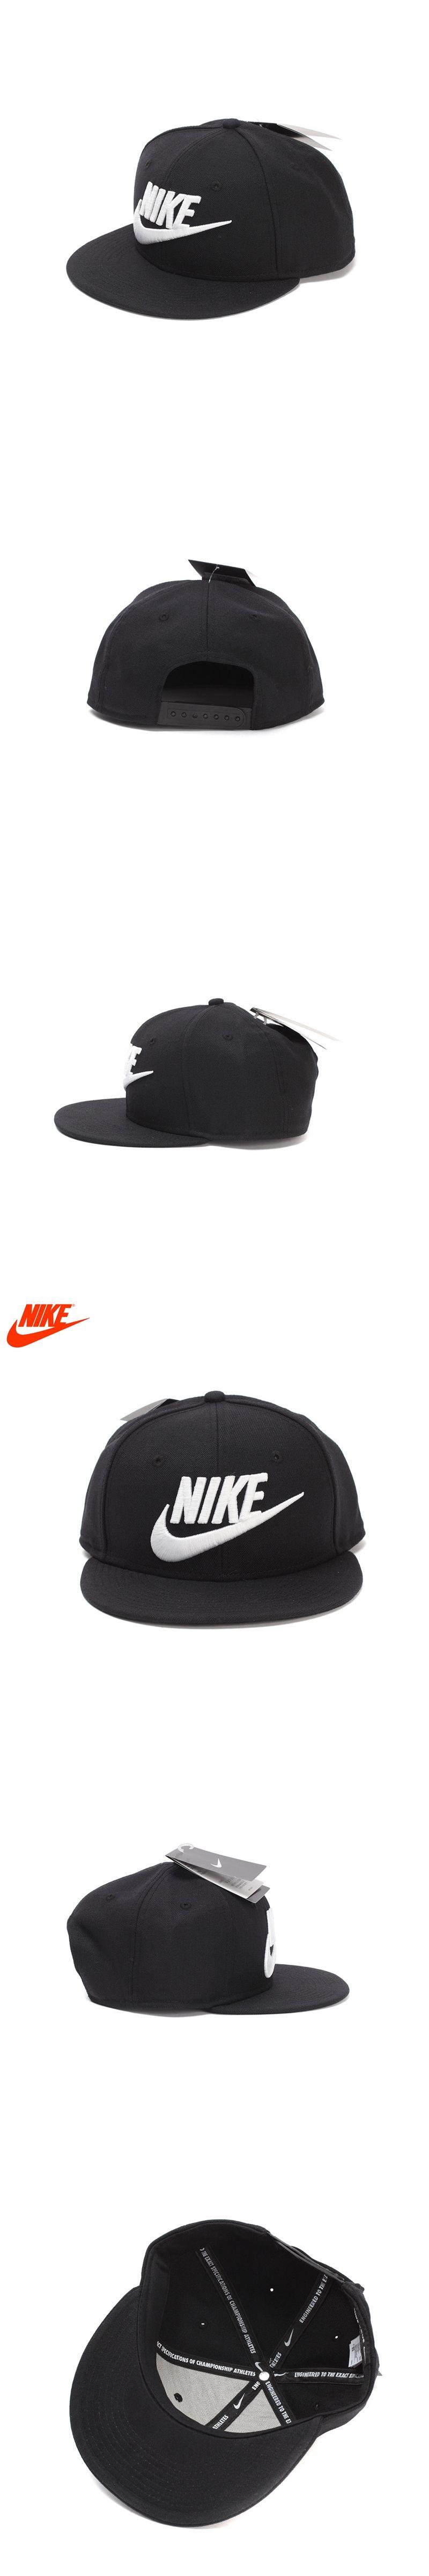 b15b4f1f33e4d Original New Arrival 2017Summer Sunshade NIKE TRUE-SNAPBACK Unisex Golf  Sport Caps Sportswear